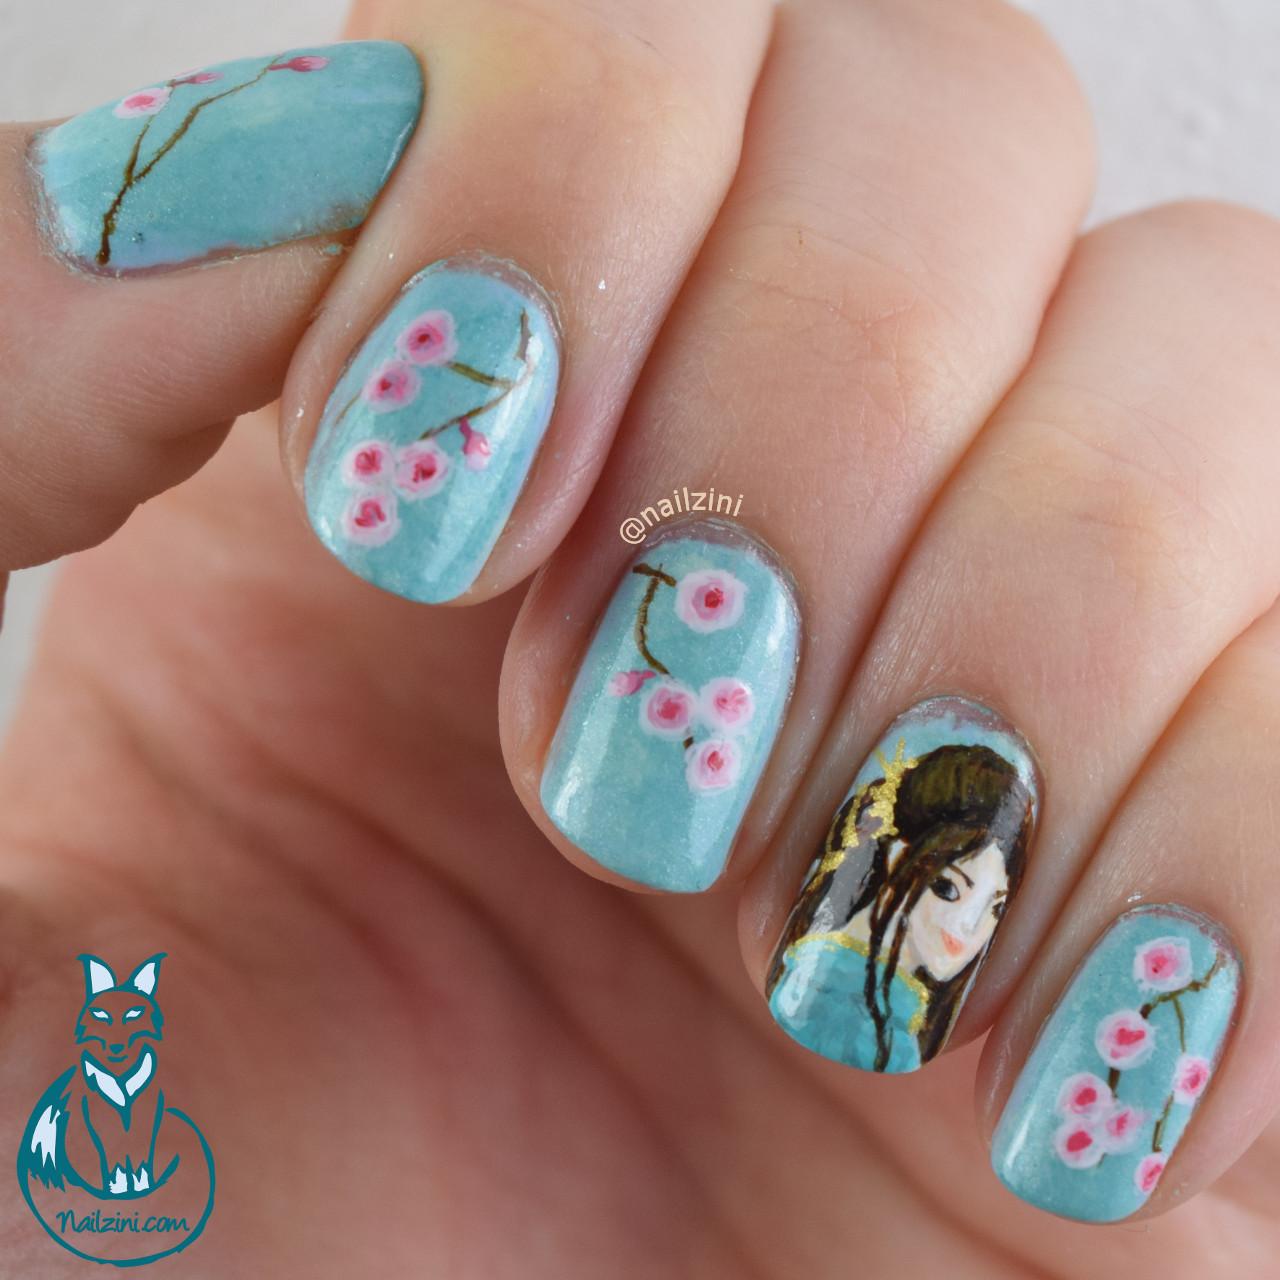 Japanese Cherry Blossom Nail Art   Nailzini: A Nail Art Blog